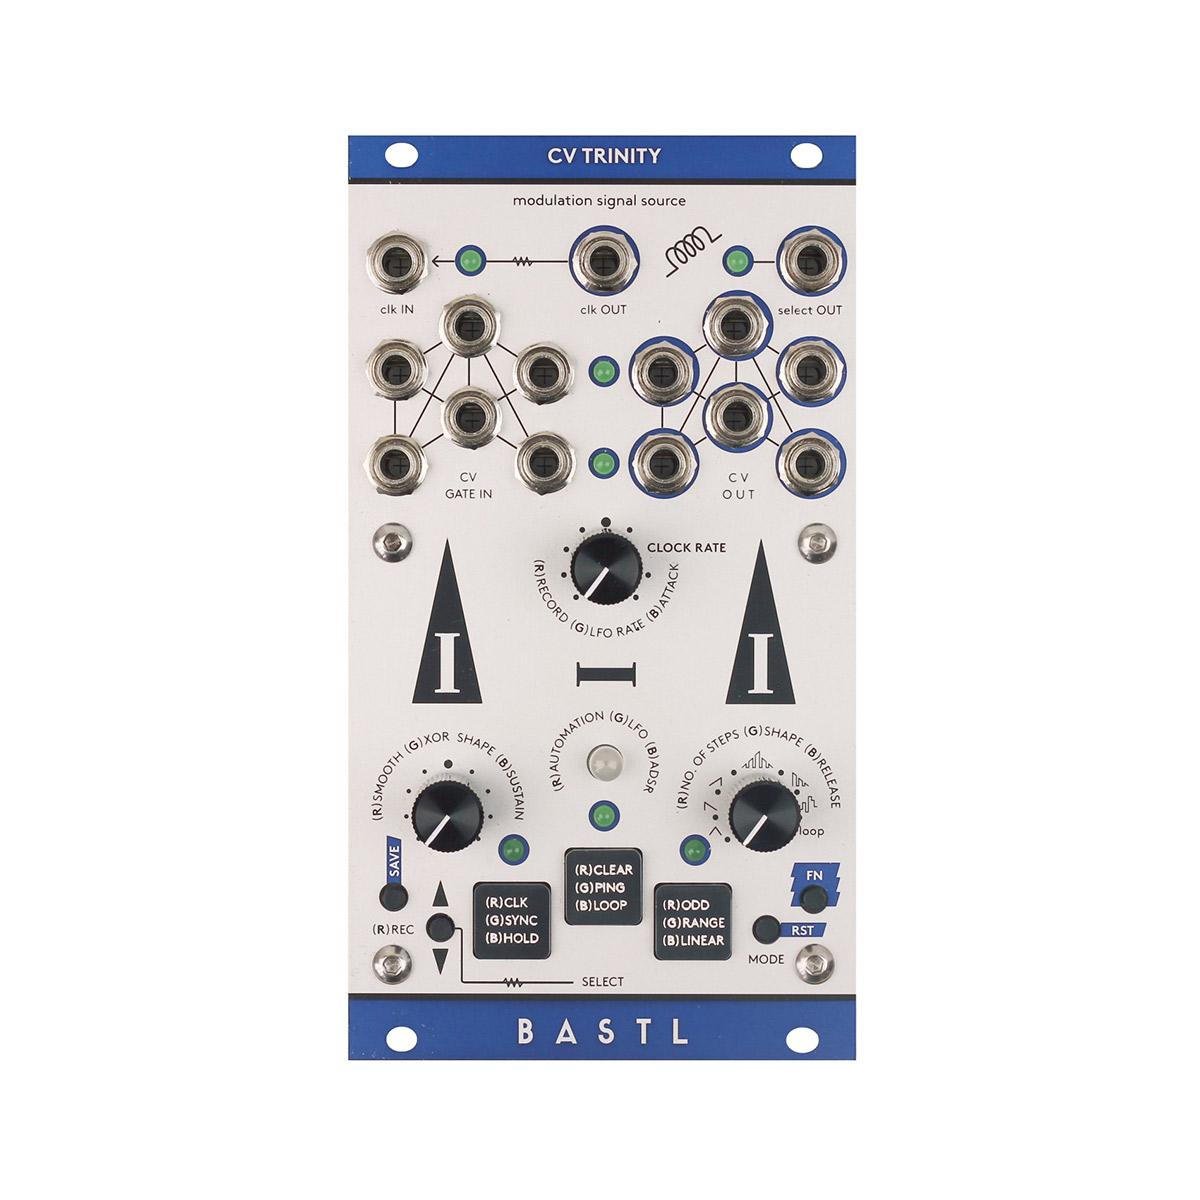 Bastl Instruments CV TRINITY TRINITY (Aluminium) 6ch×3モードCVプロセッサー【バストルインストゥルメンツ CV モジュラーシンセ (Aluminium)】, 常設!赤ちゃんフェア:2a236034 --- sunward.msk.ru